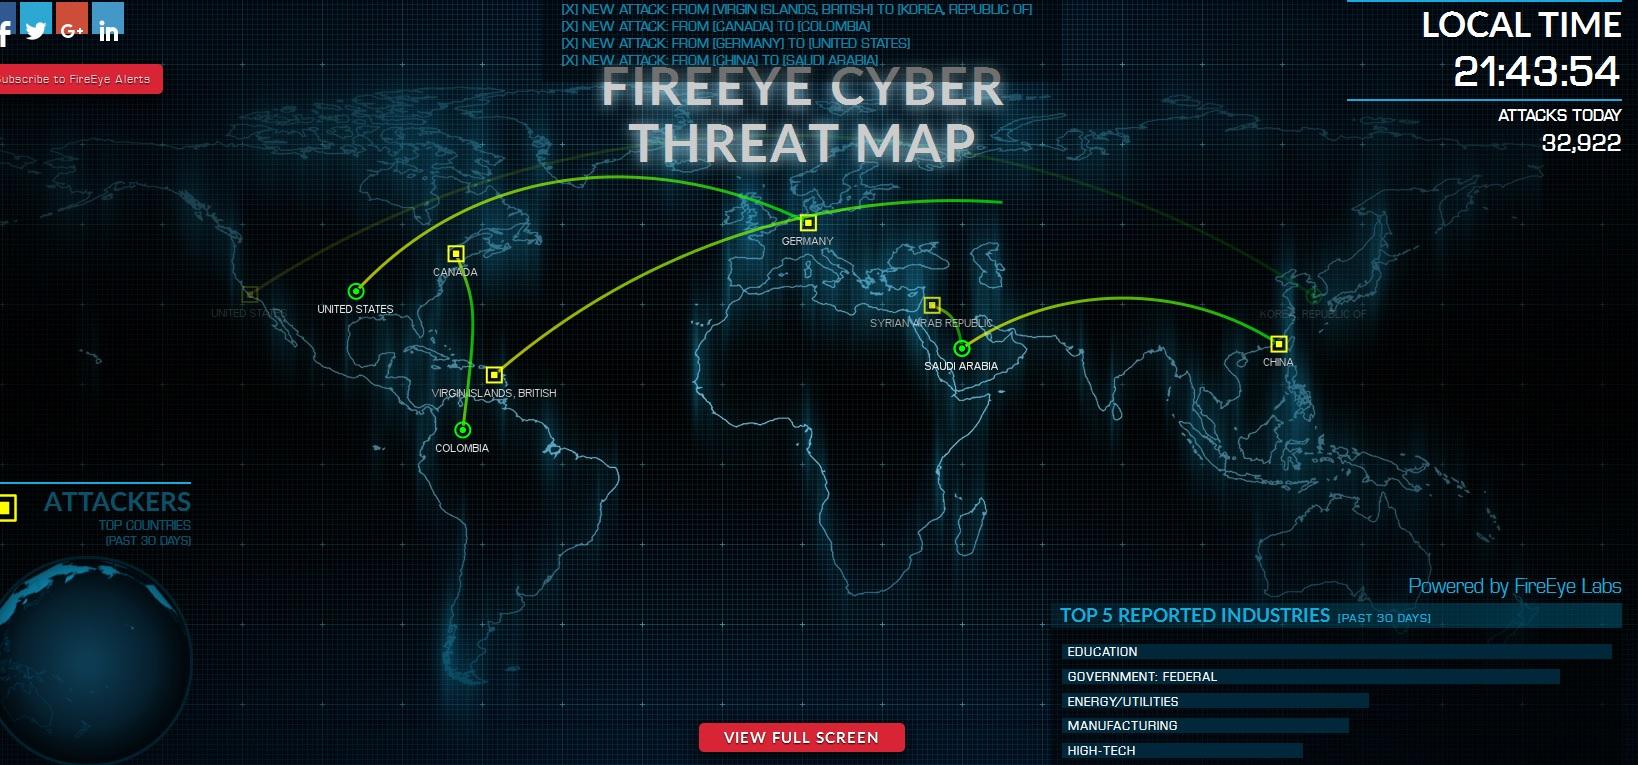 Best Security News Sites